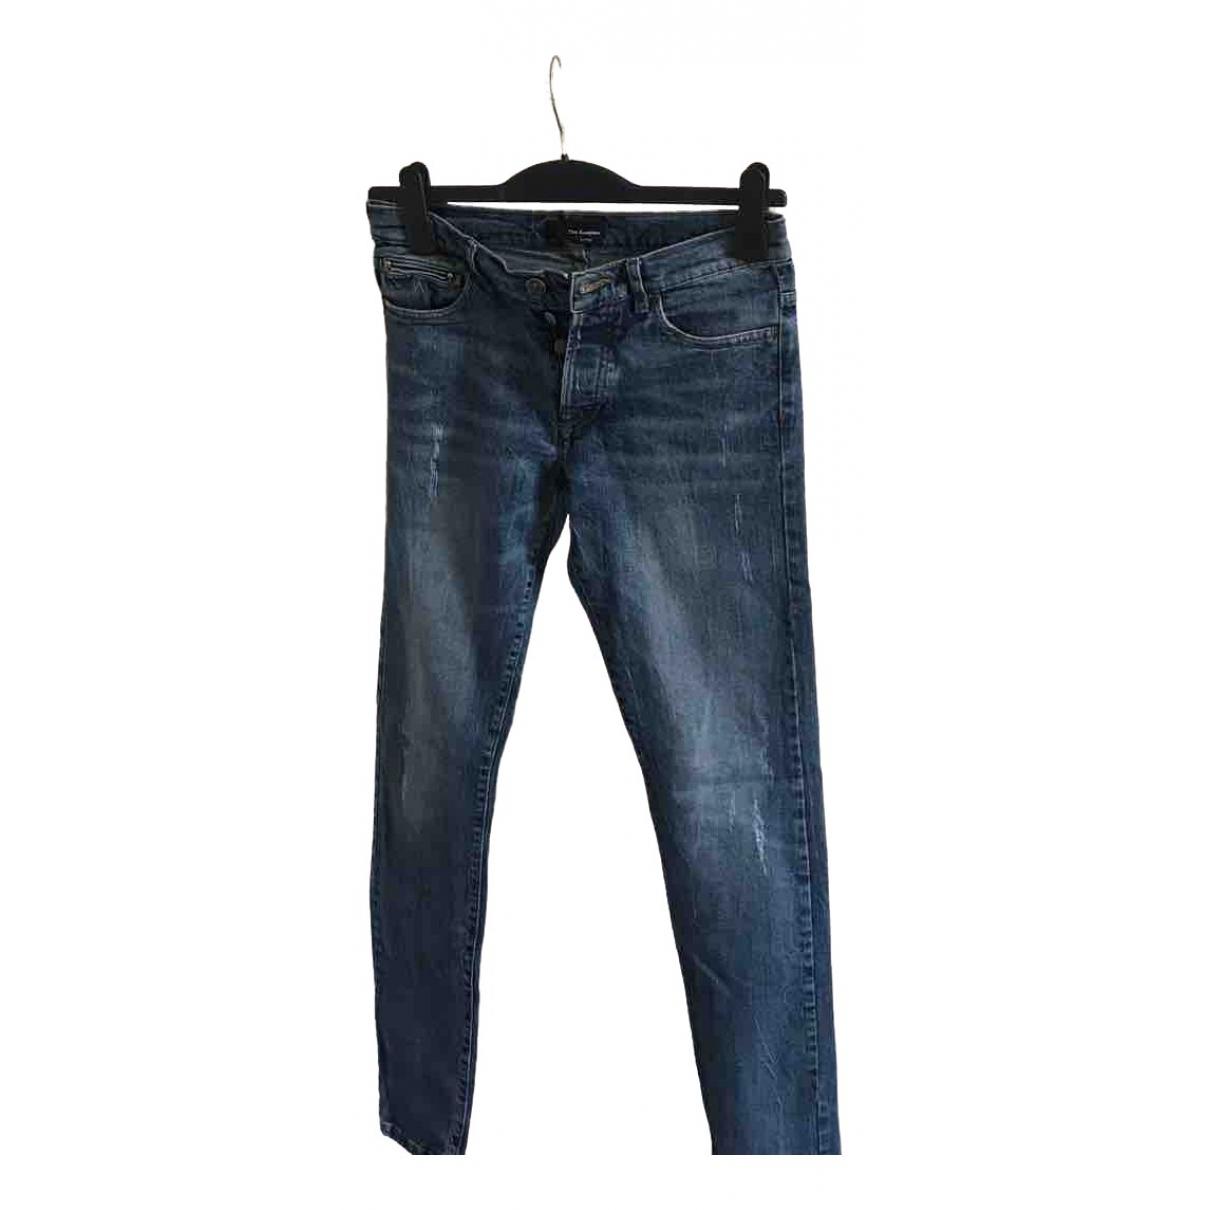 The Kooples Spring Summer 2019 Blue Cotton Jeans for Men 27 US